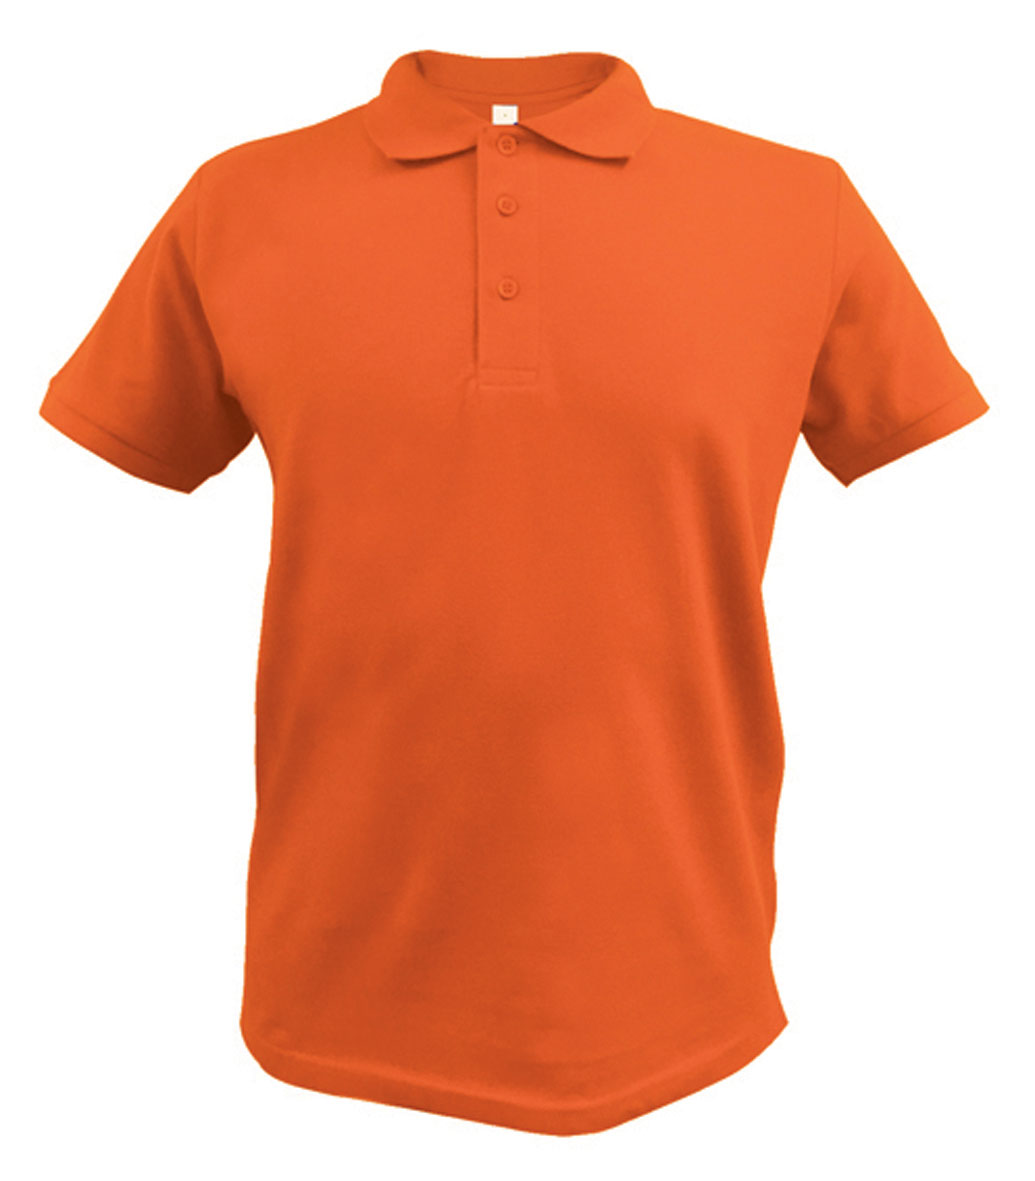 Orange Ace Polo shirt